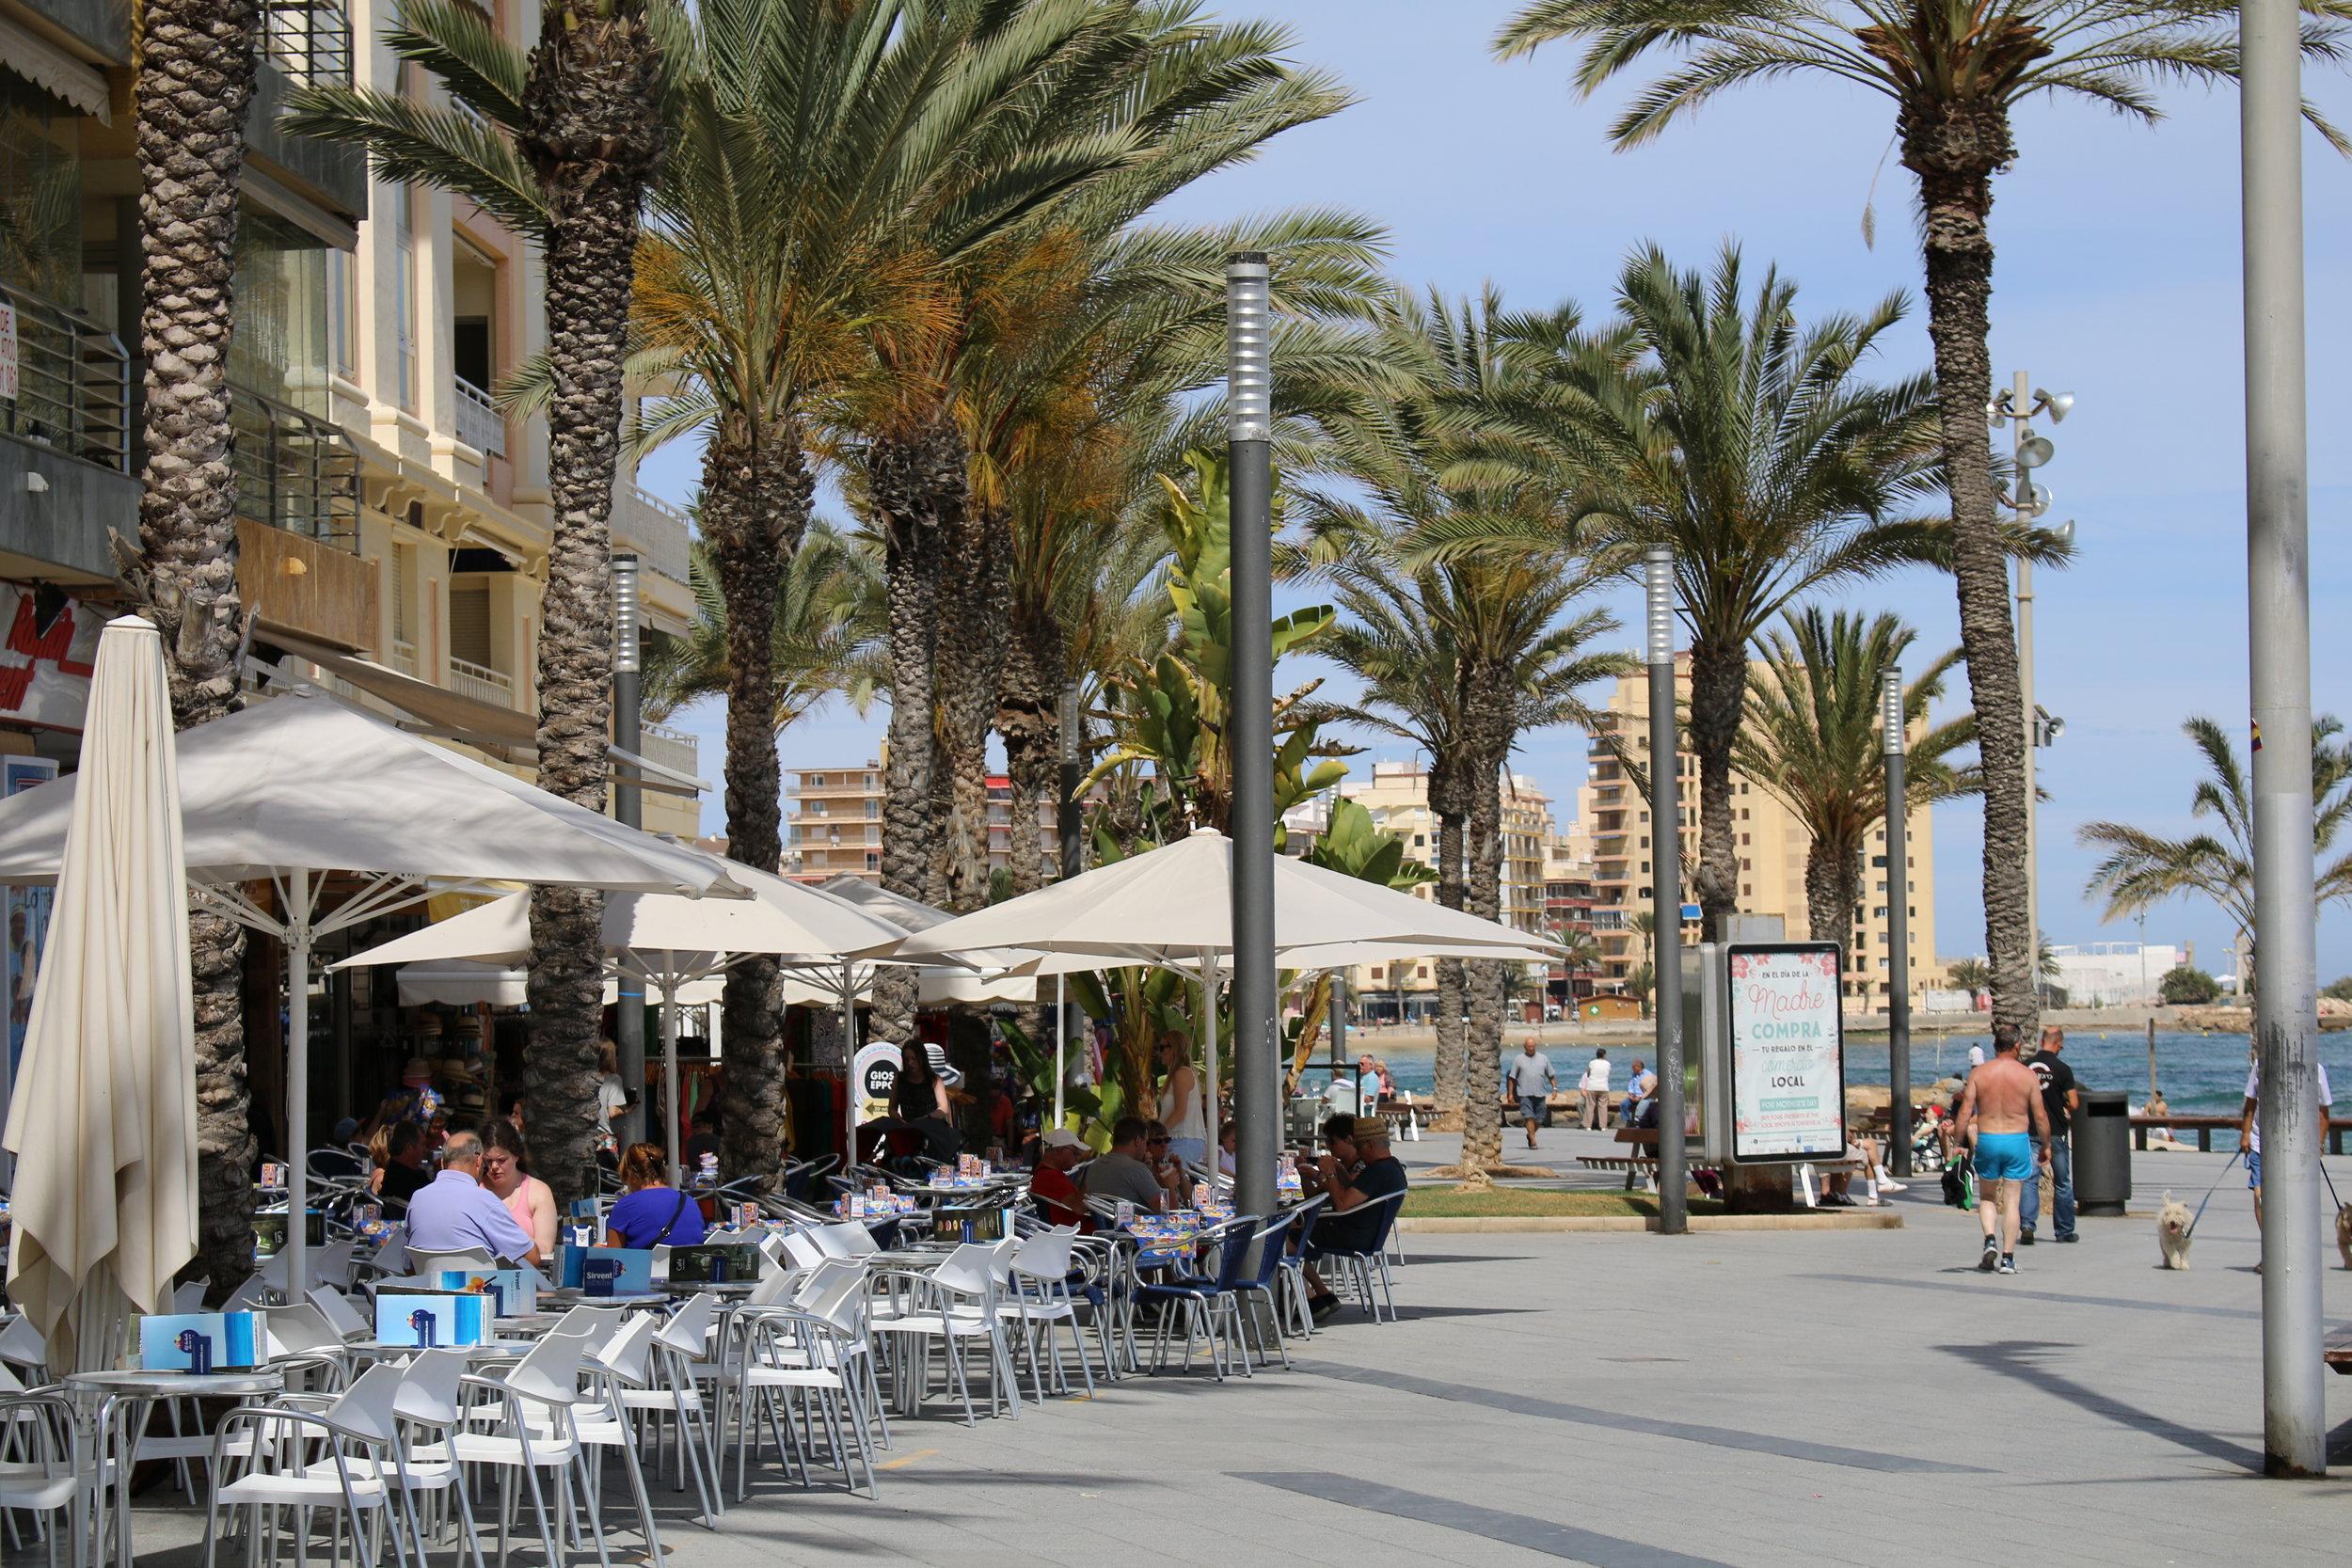 Klassisk spansk feriestil ved strandpromenaden i Torrevieja.